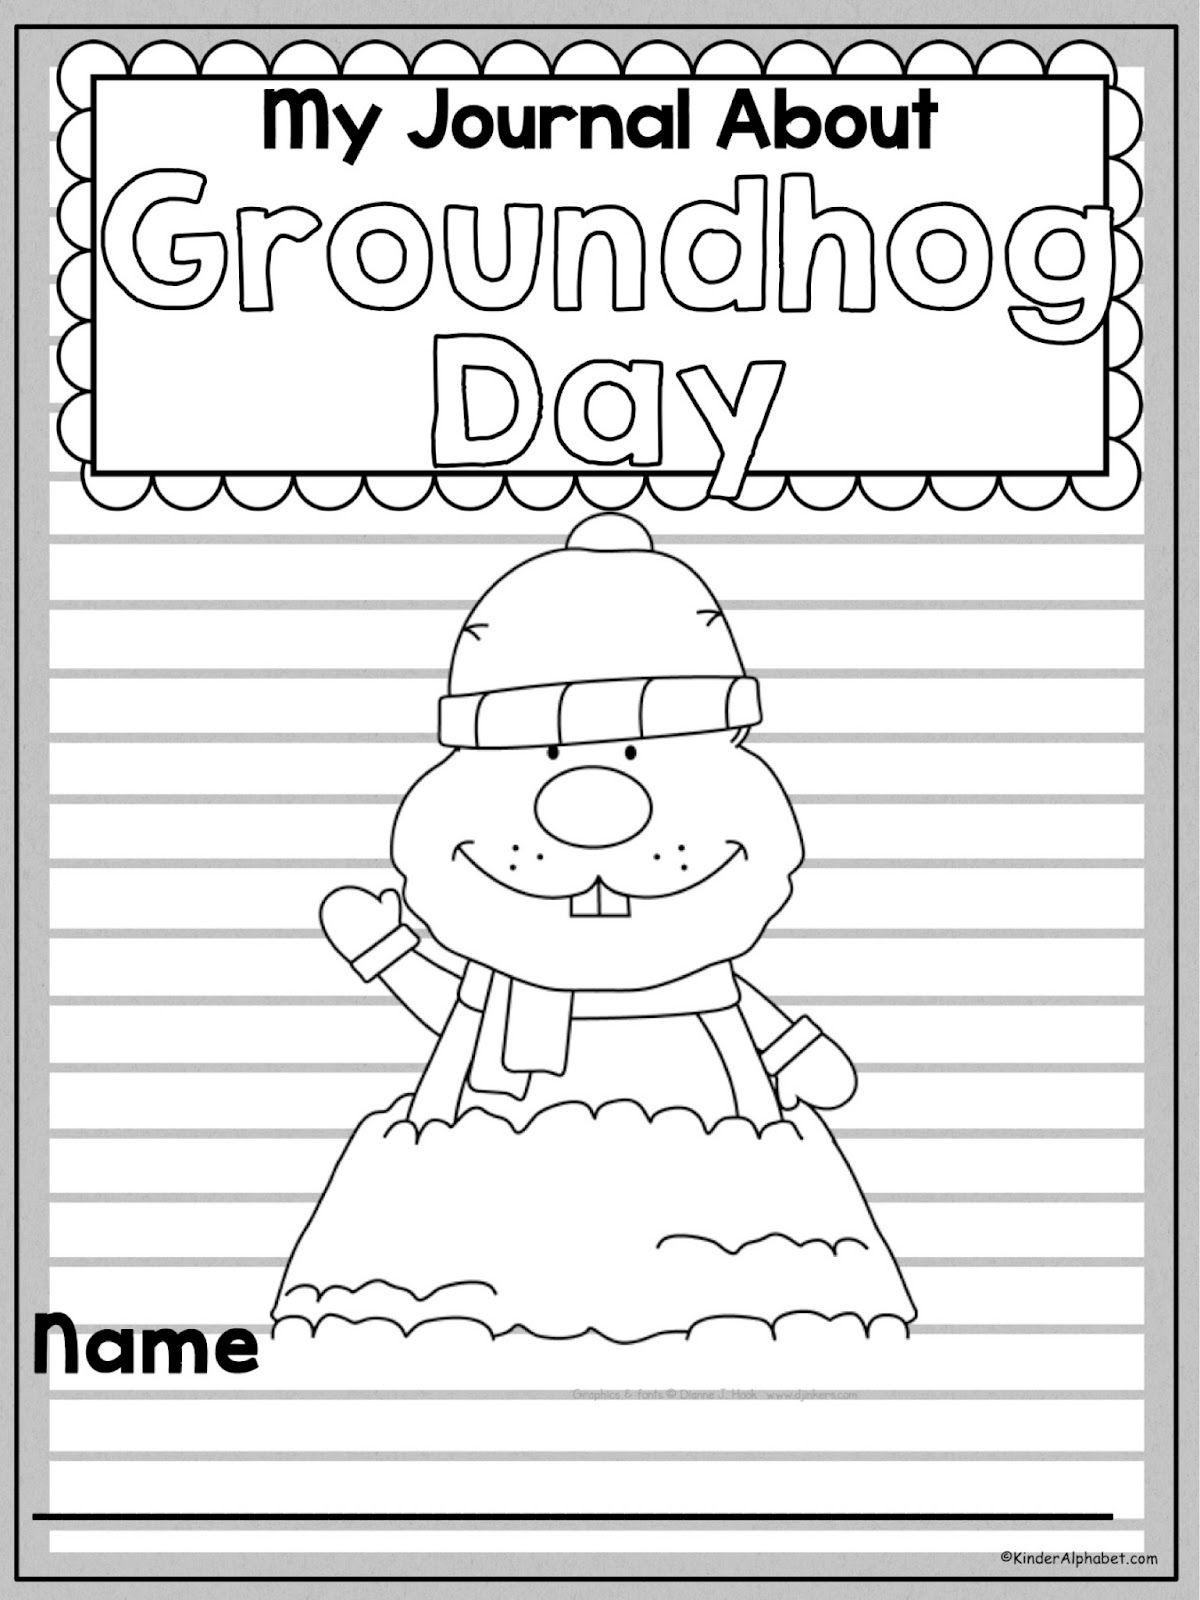 Groundhog Day Freebie On The Blog